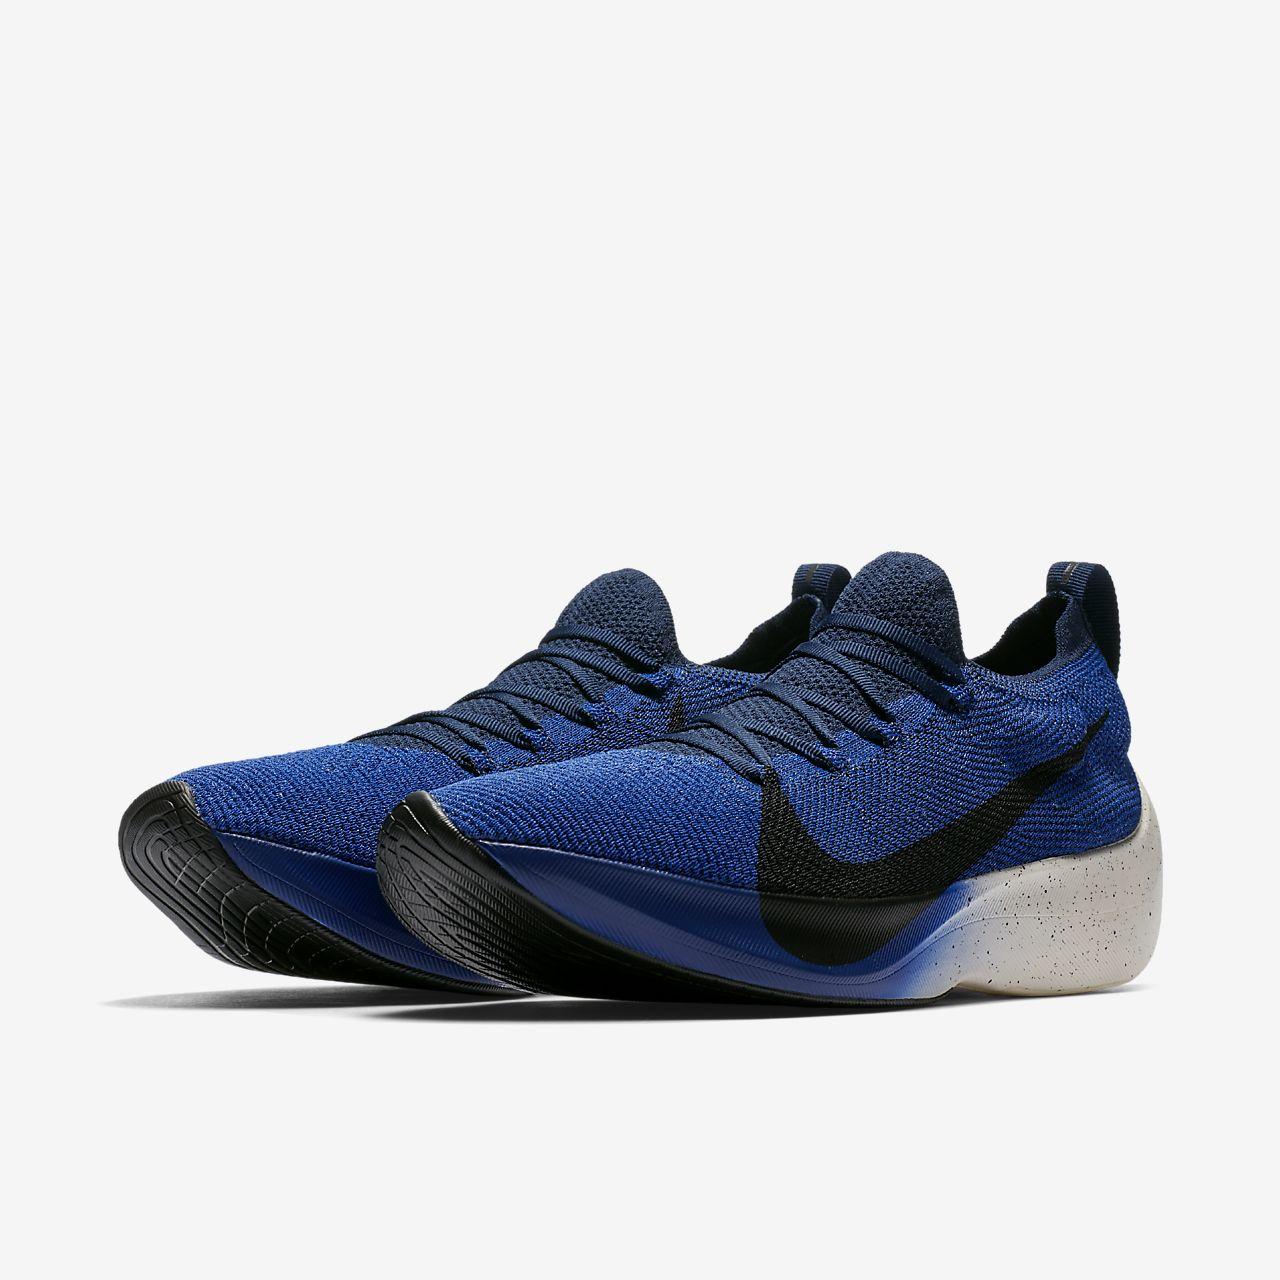 349a4b9d1c Nike React Vapor Street Flyknit Men's Shoe. Nike.com NZ